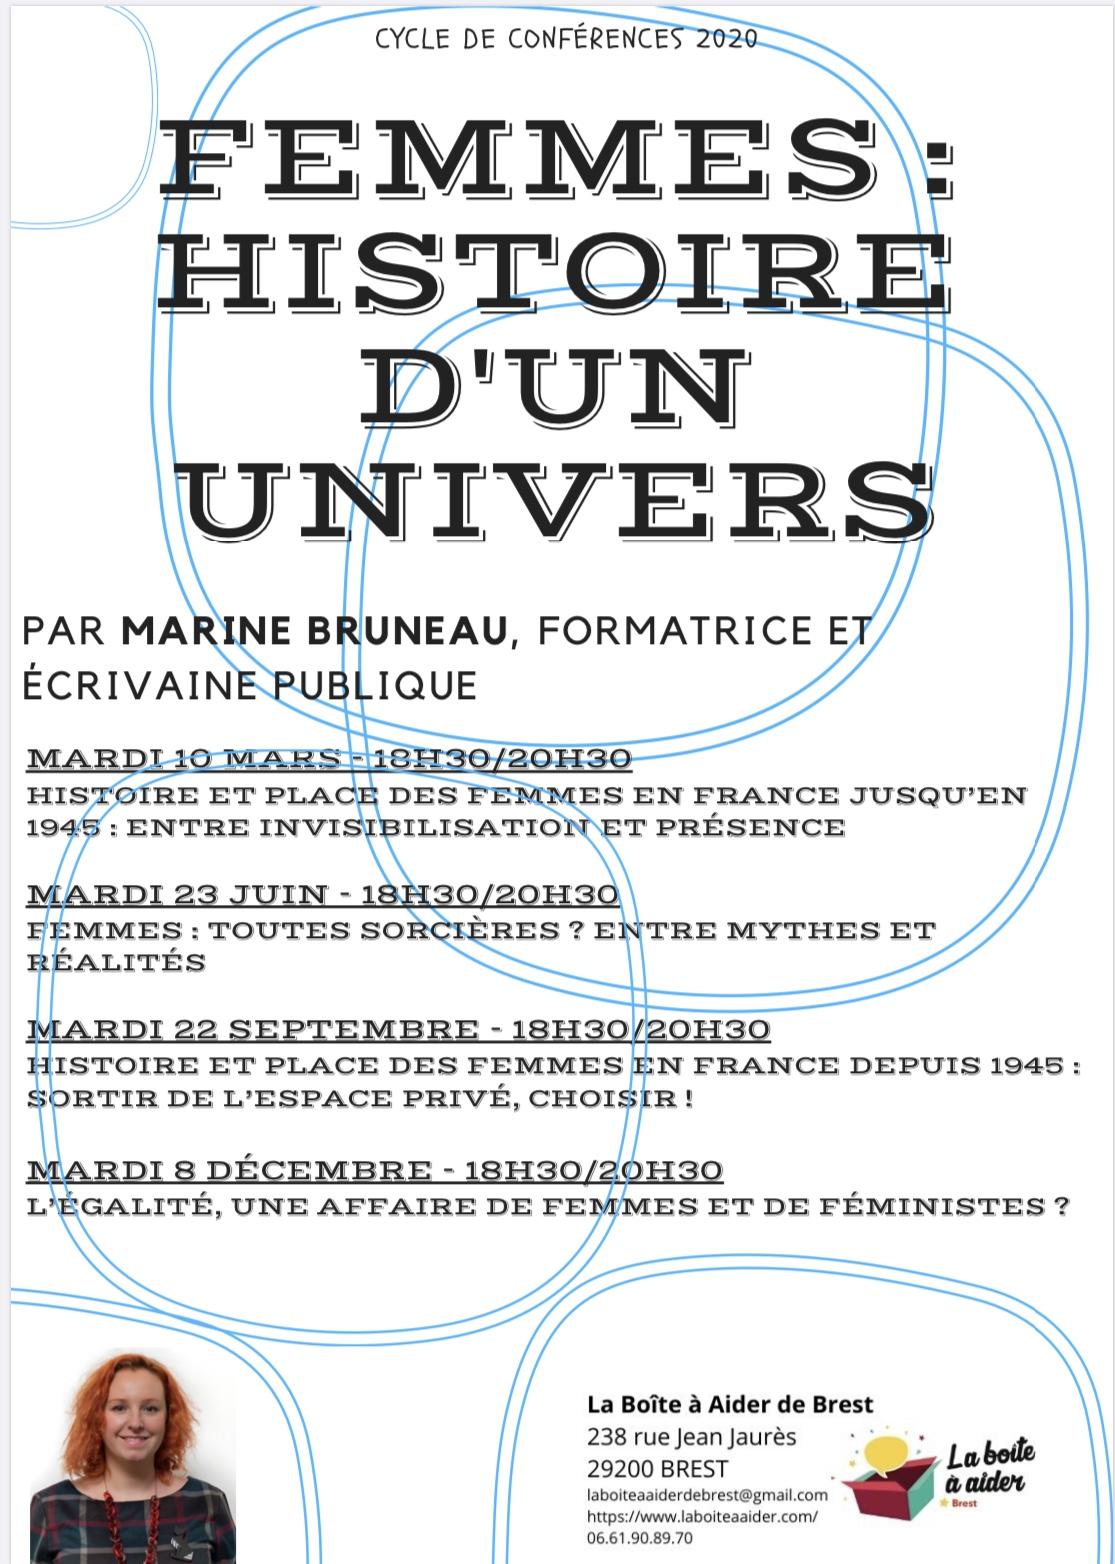 Marine Bruneau